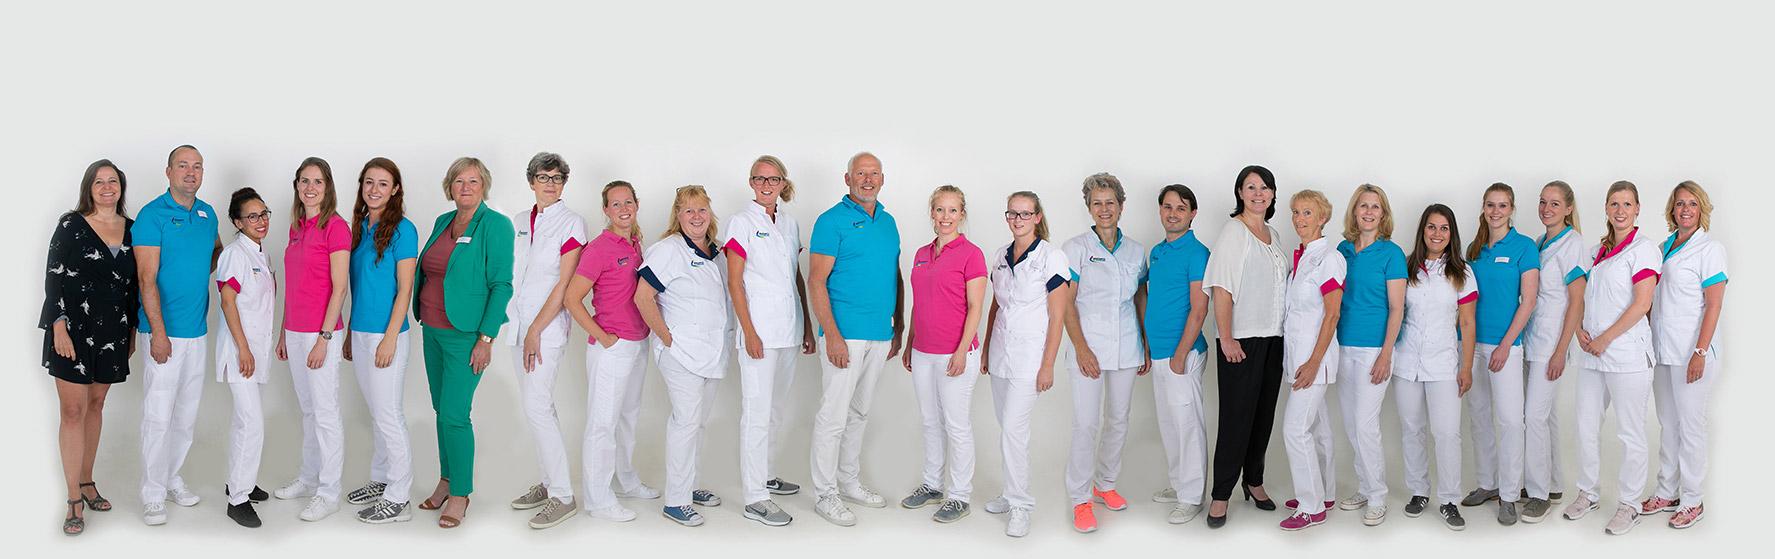 tandarts team de boemerang